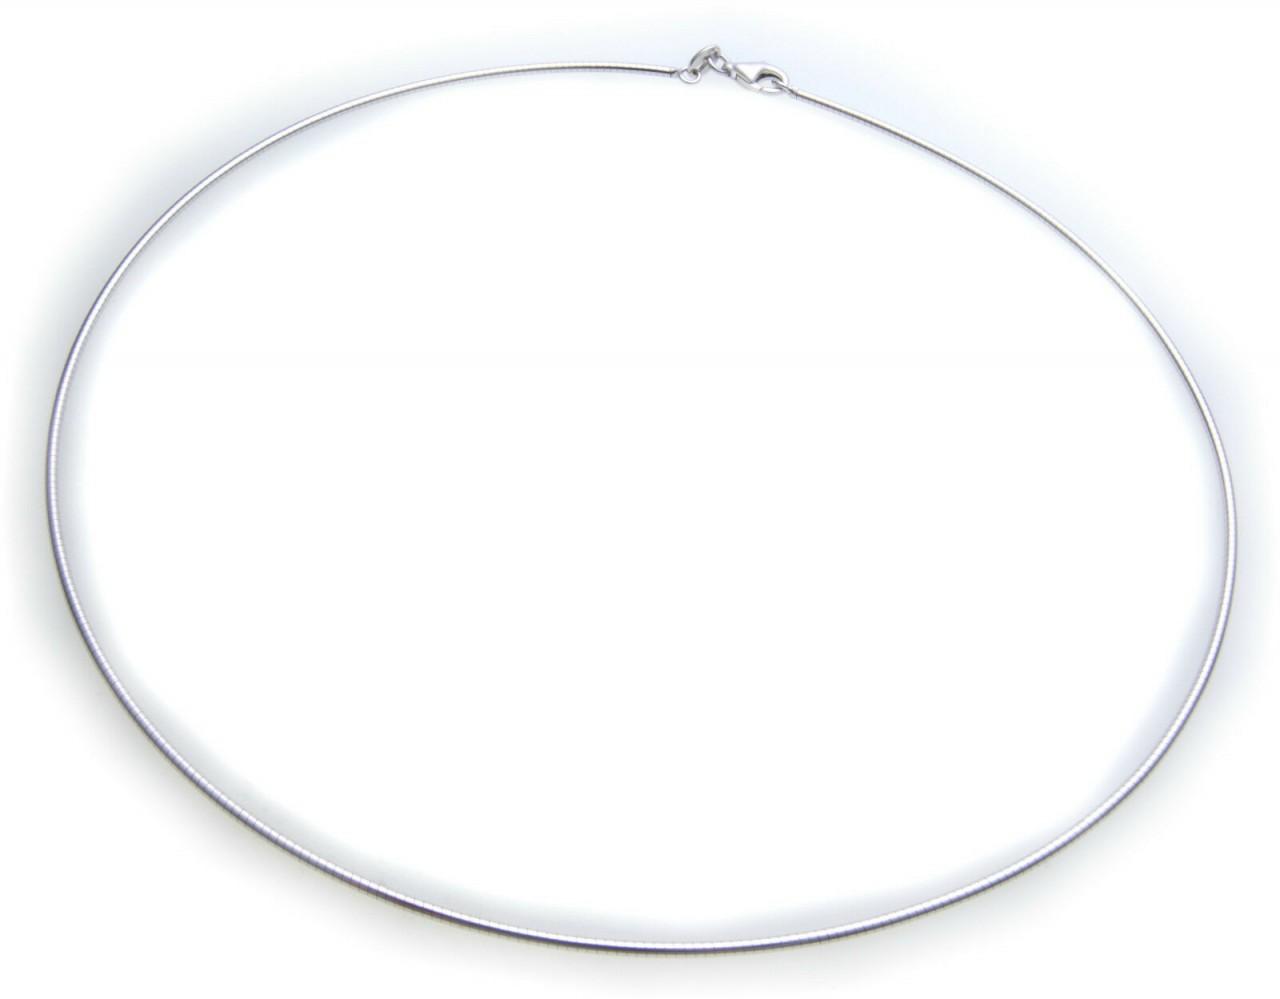 exkl Collier echt Silber 925 Sterlingsilber Halsreif Qualität Halskette Damen